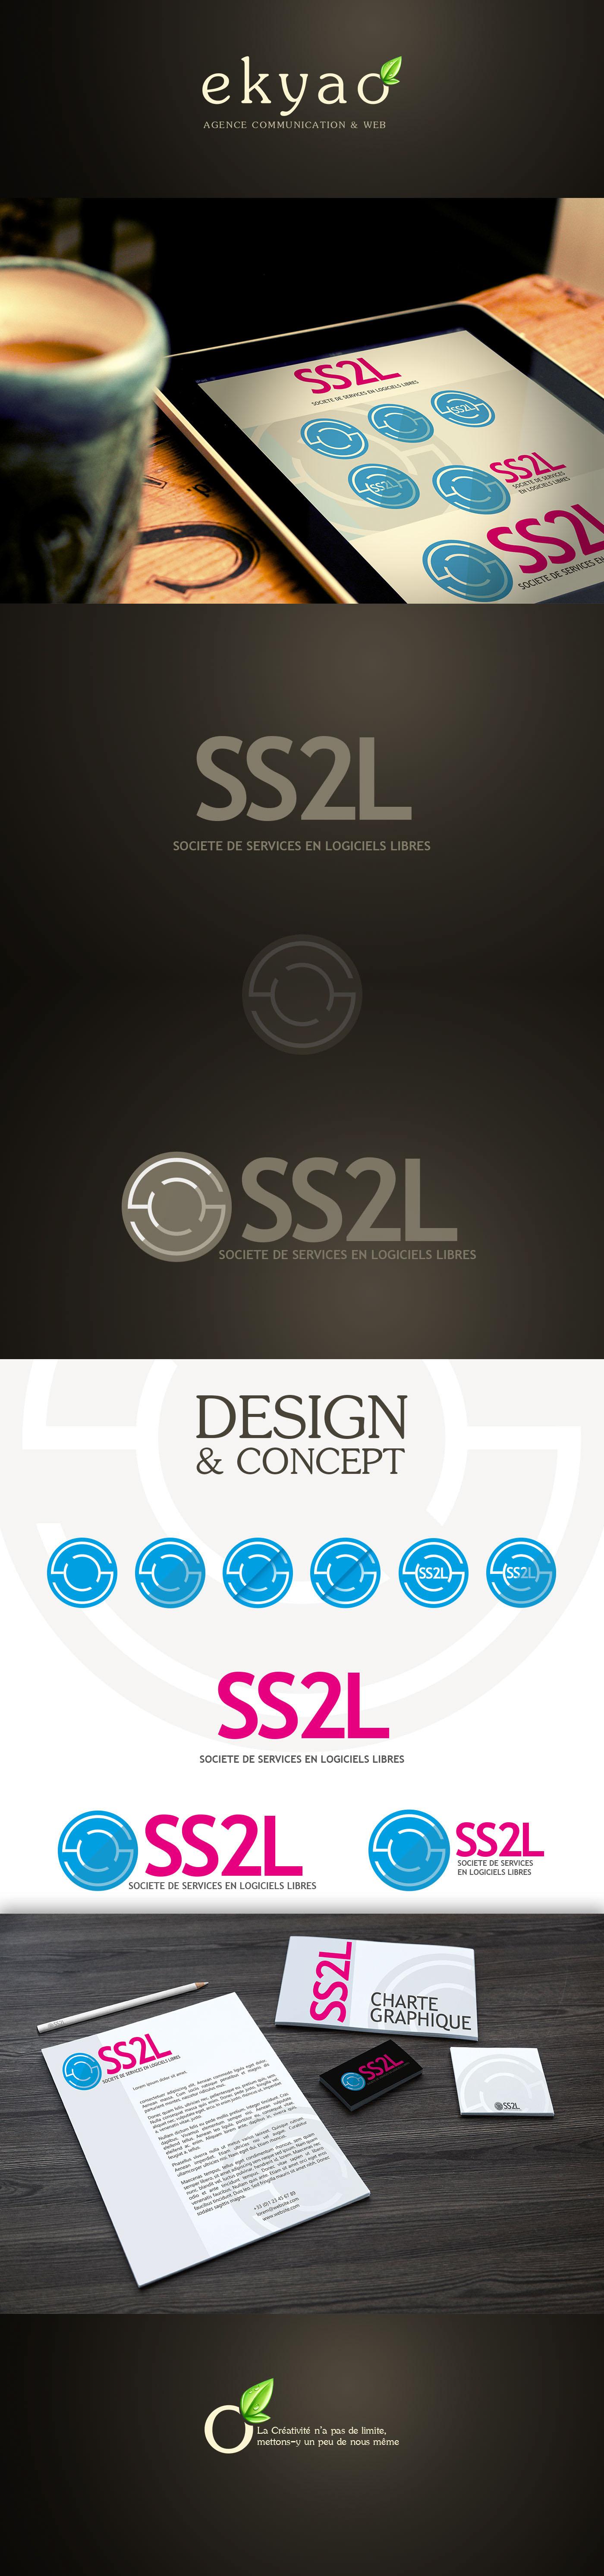 Adobe Portfolio ekyao Webdesign design logo presentation portfolio marketing   agence communication Web